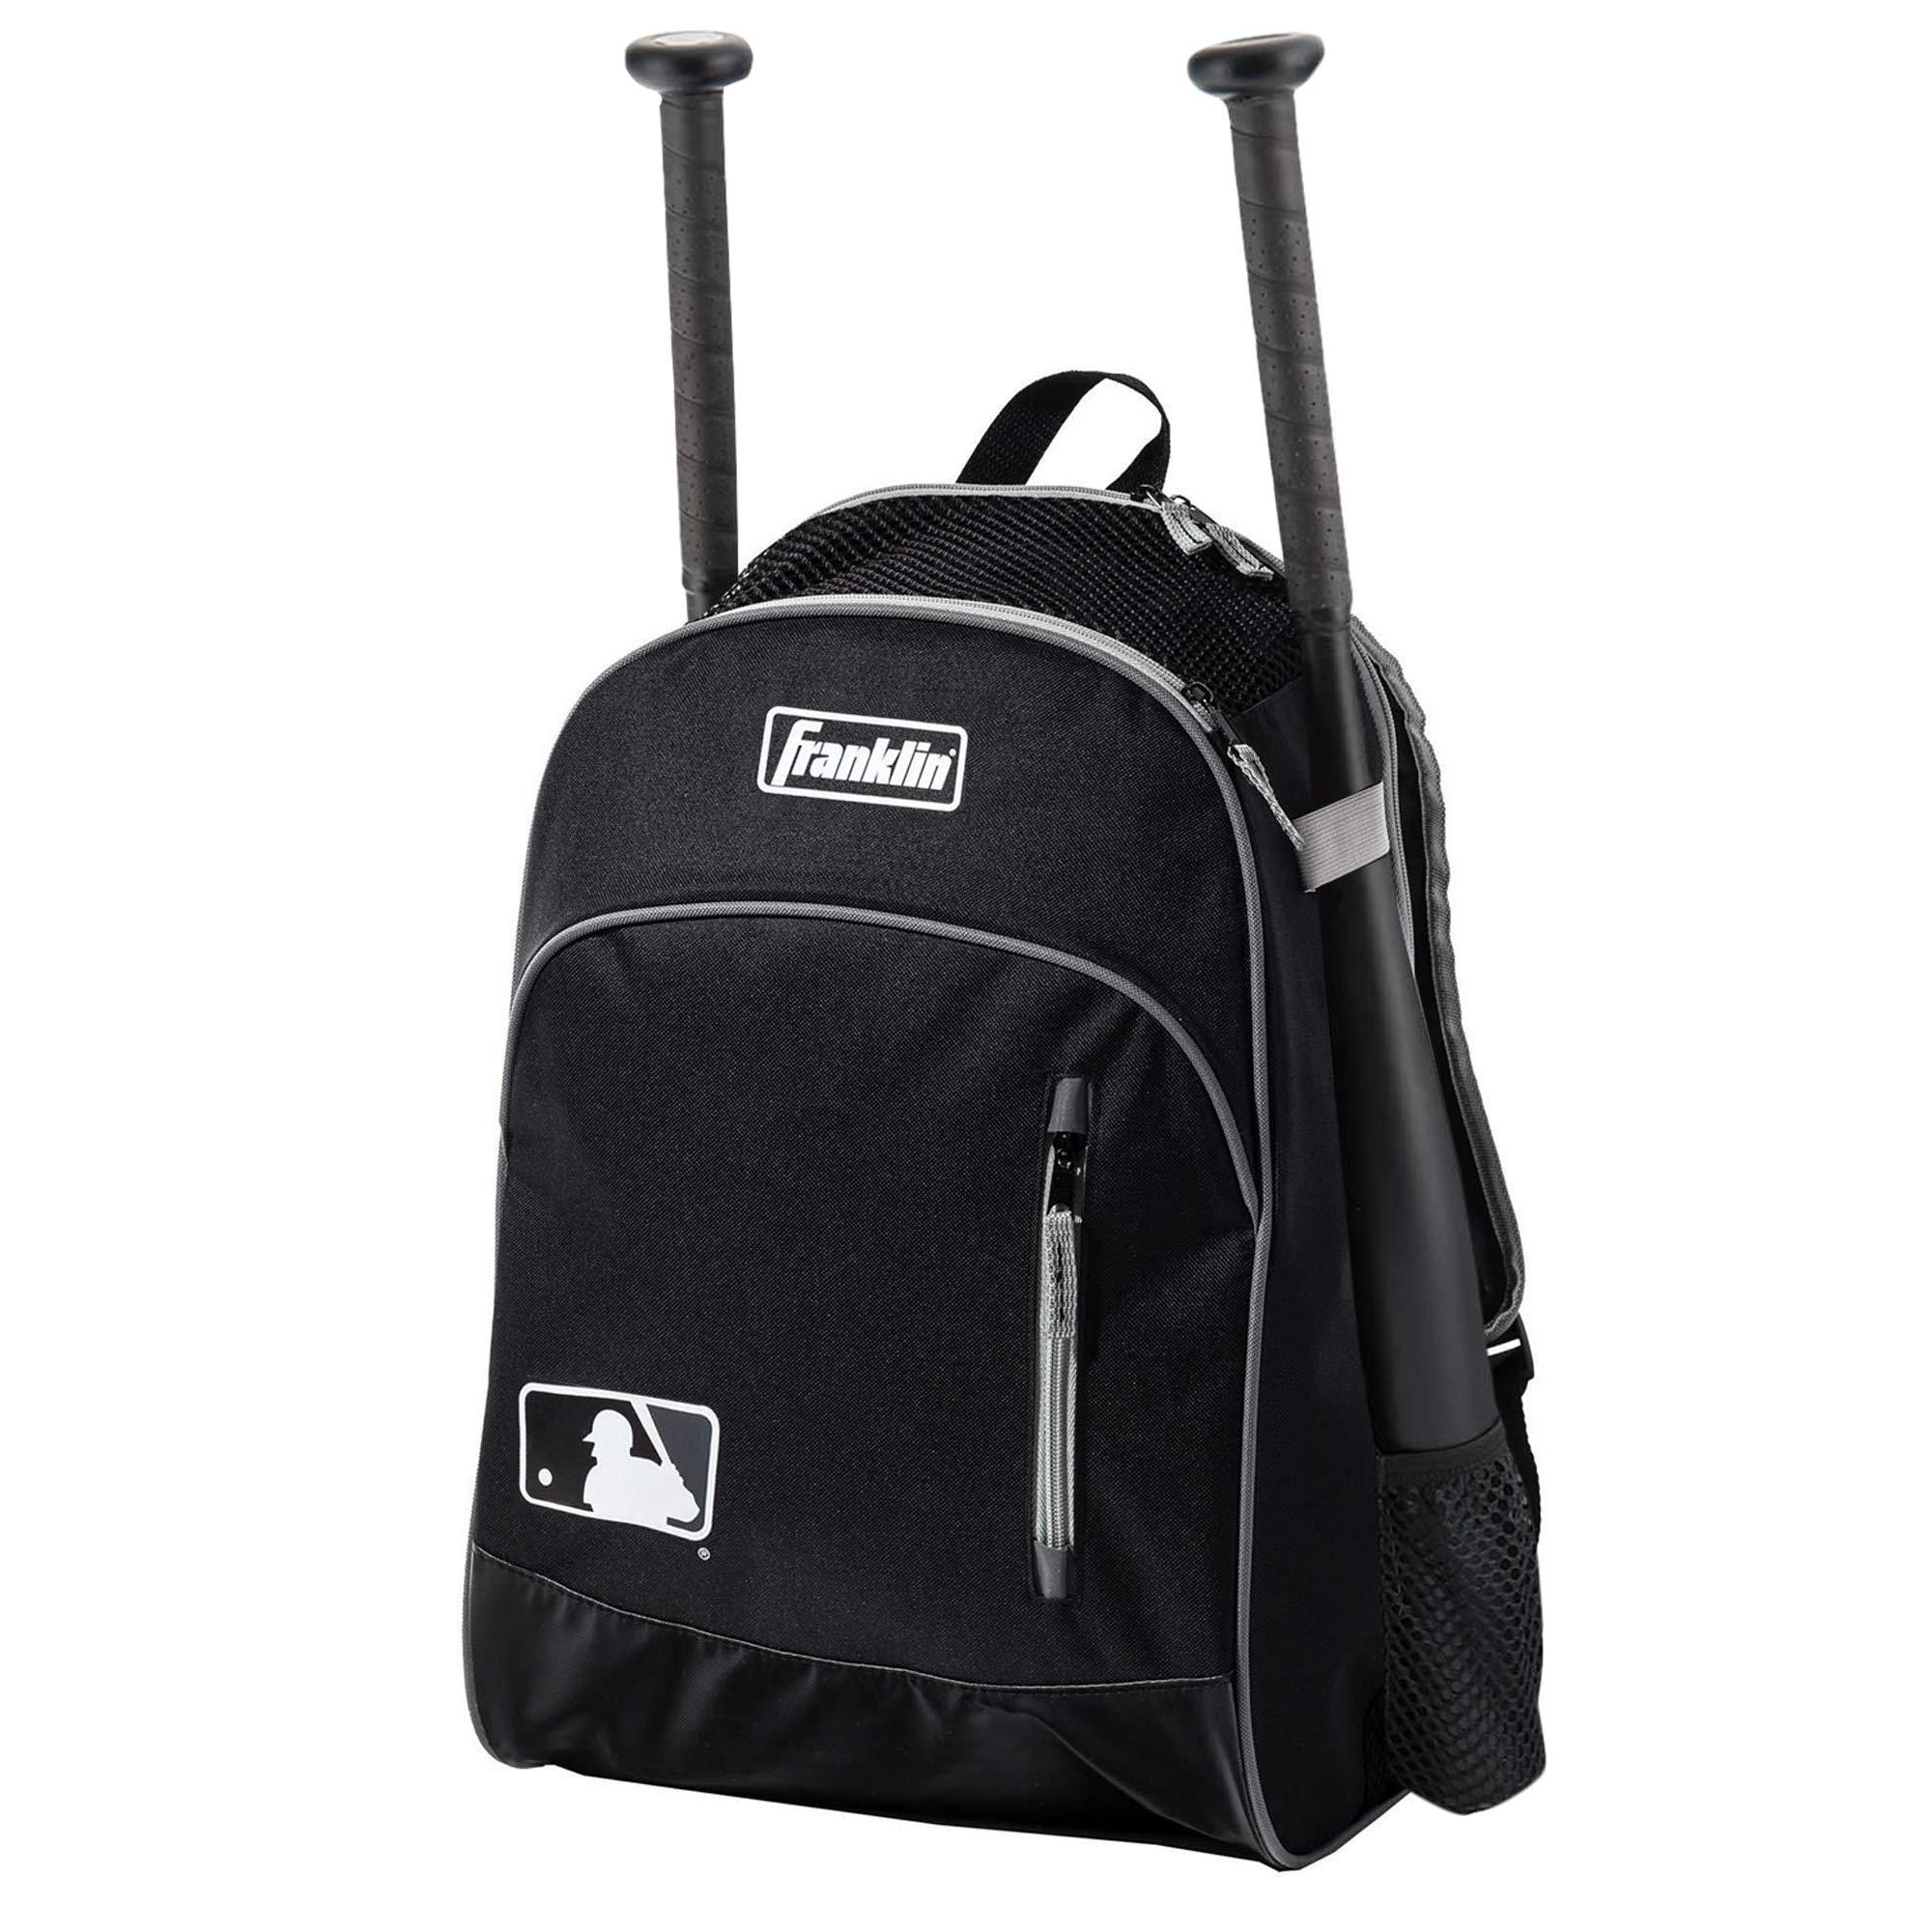 Franklin Sports MLB Batpack Bag - Perfect for Baseball, Softball, & T-Ball - Black/Gray